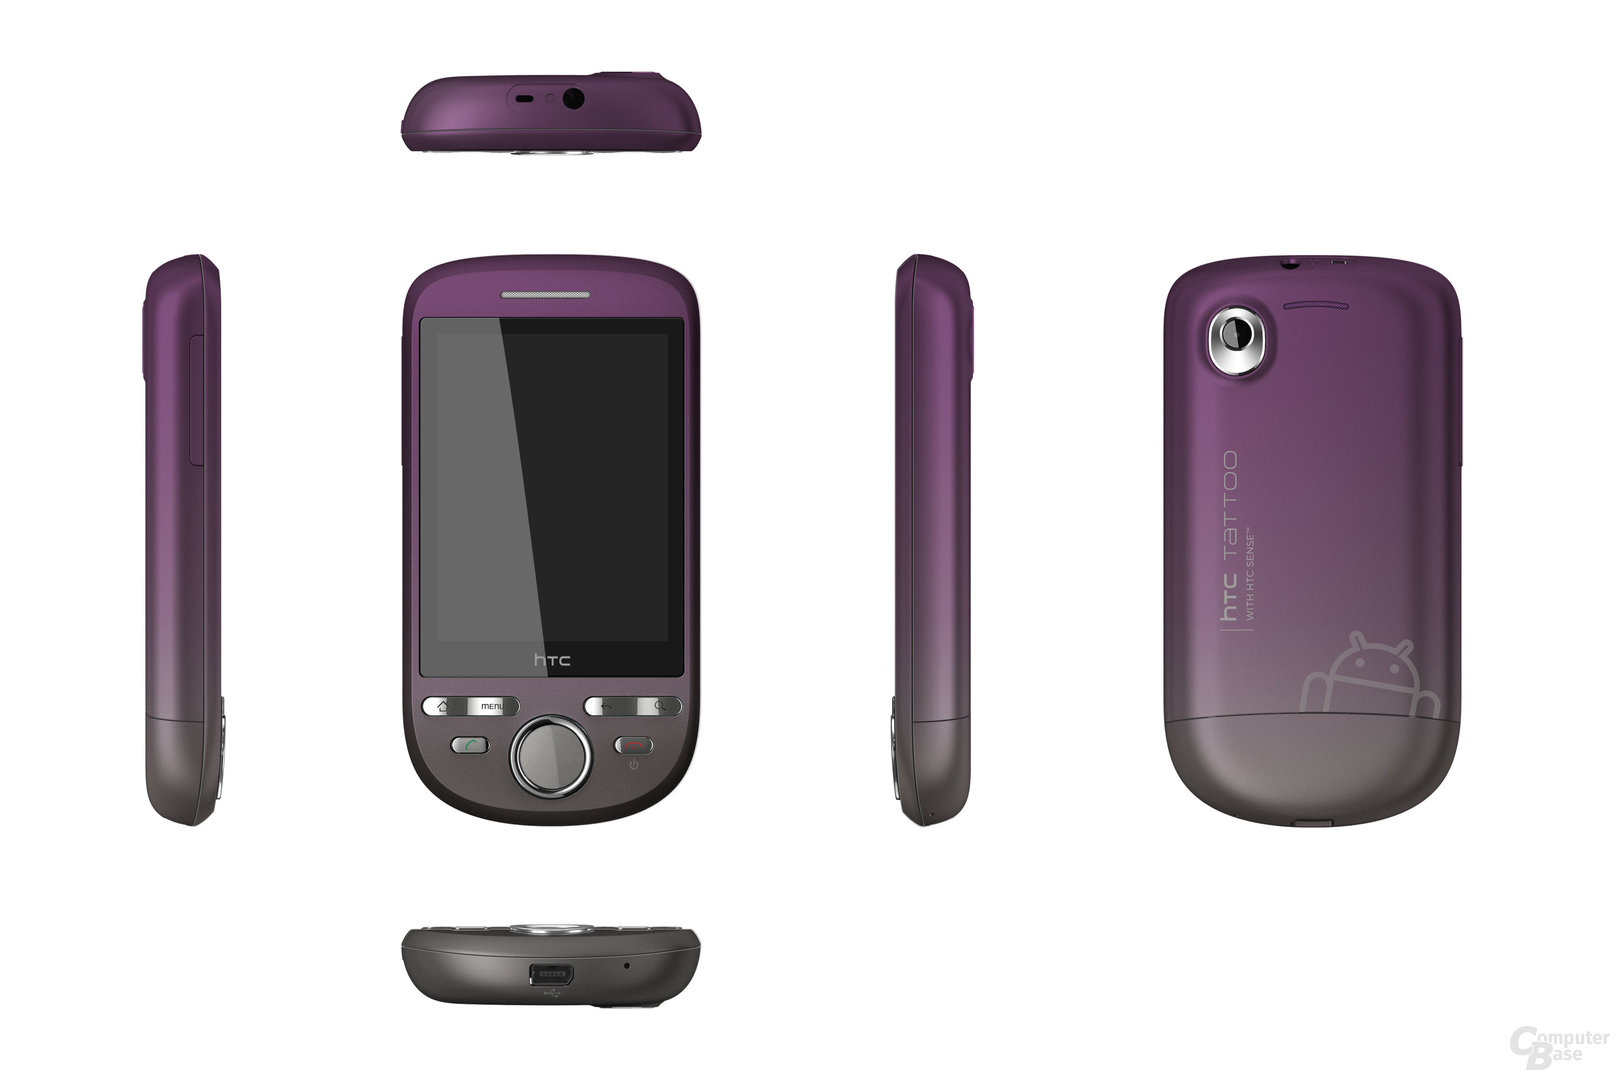 HTC Tattoo Mature Purple